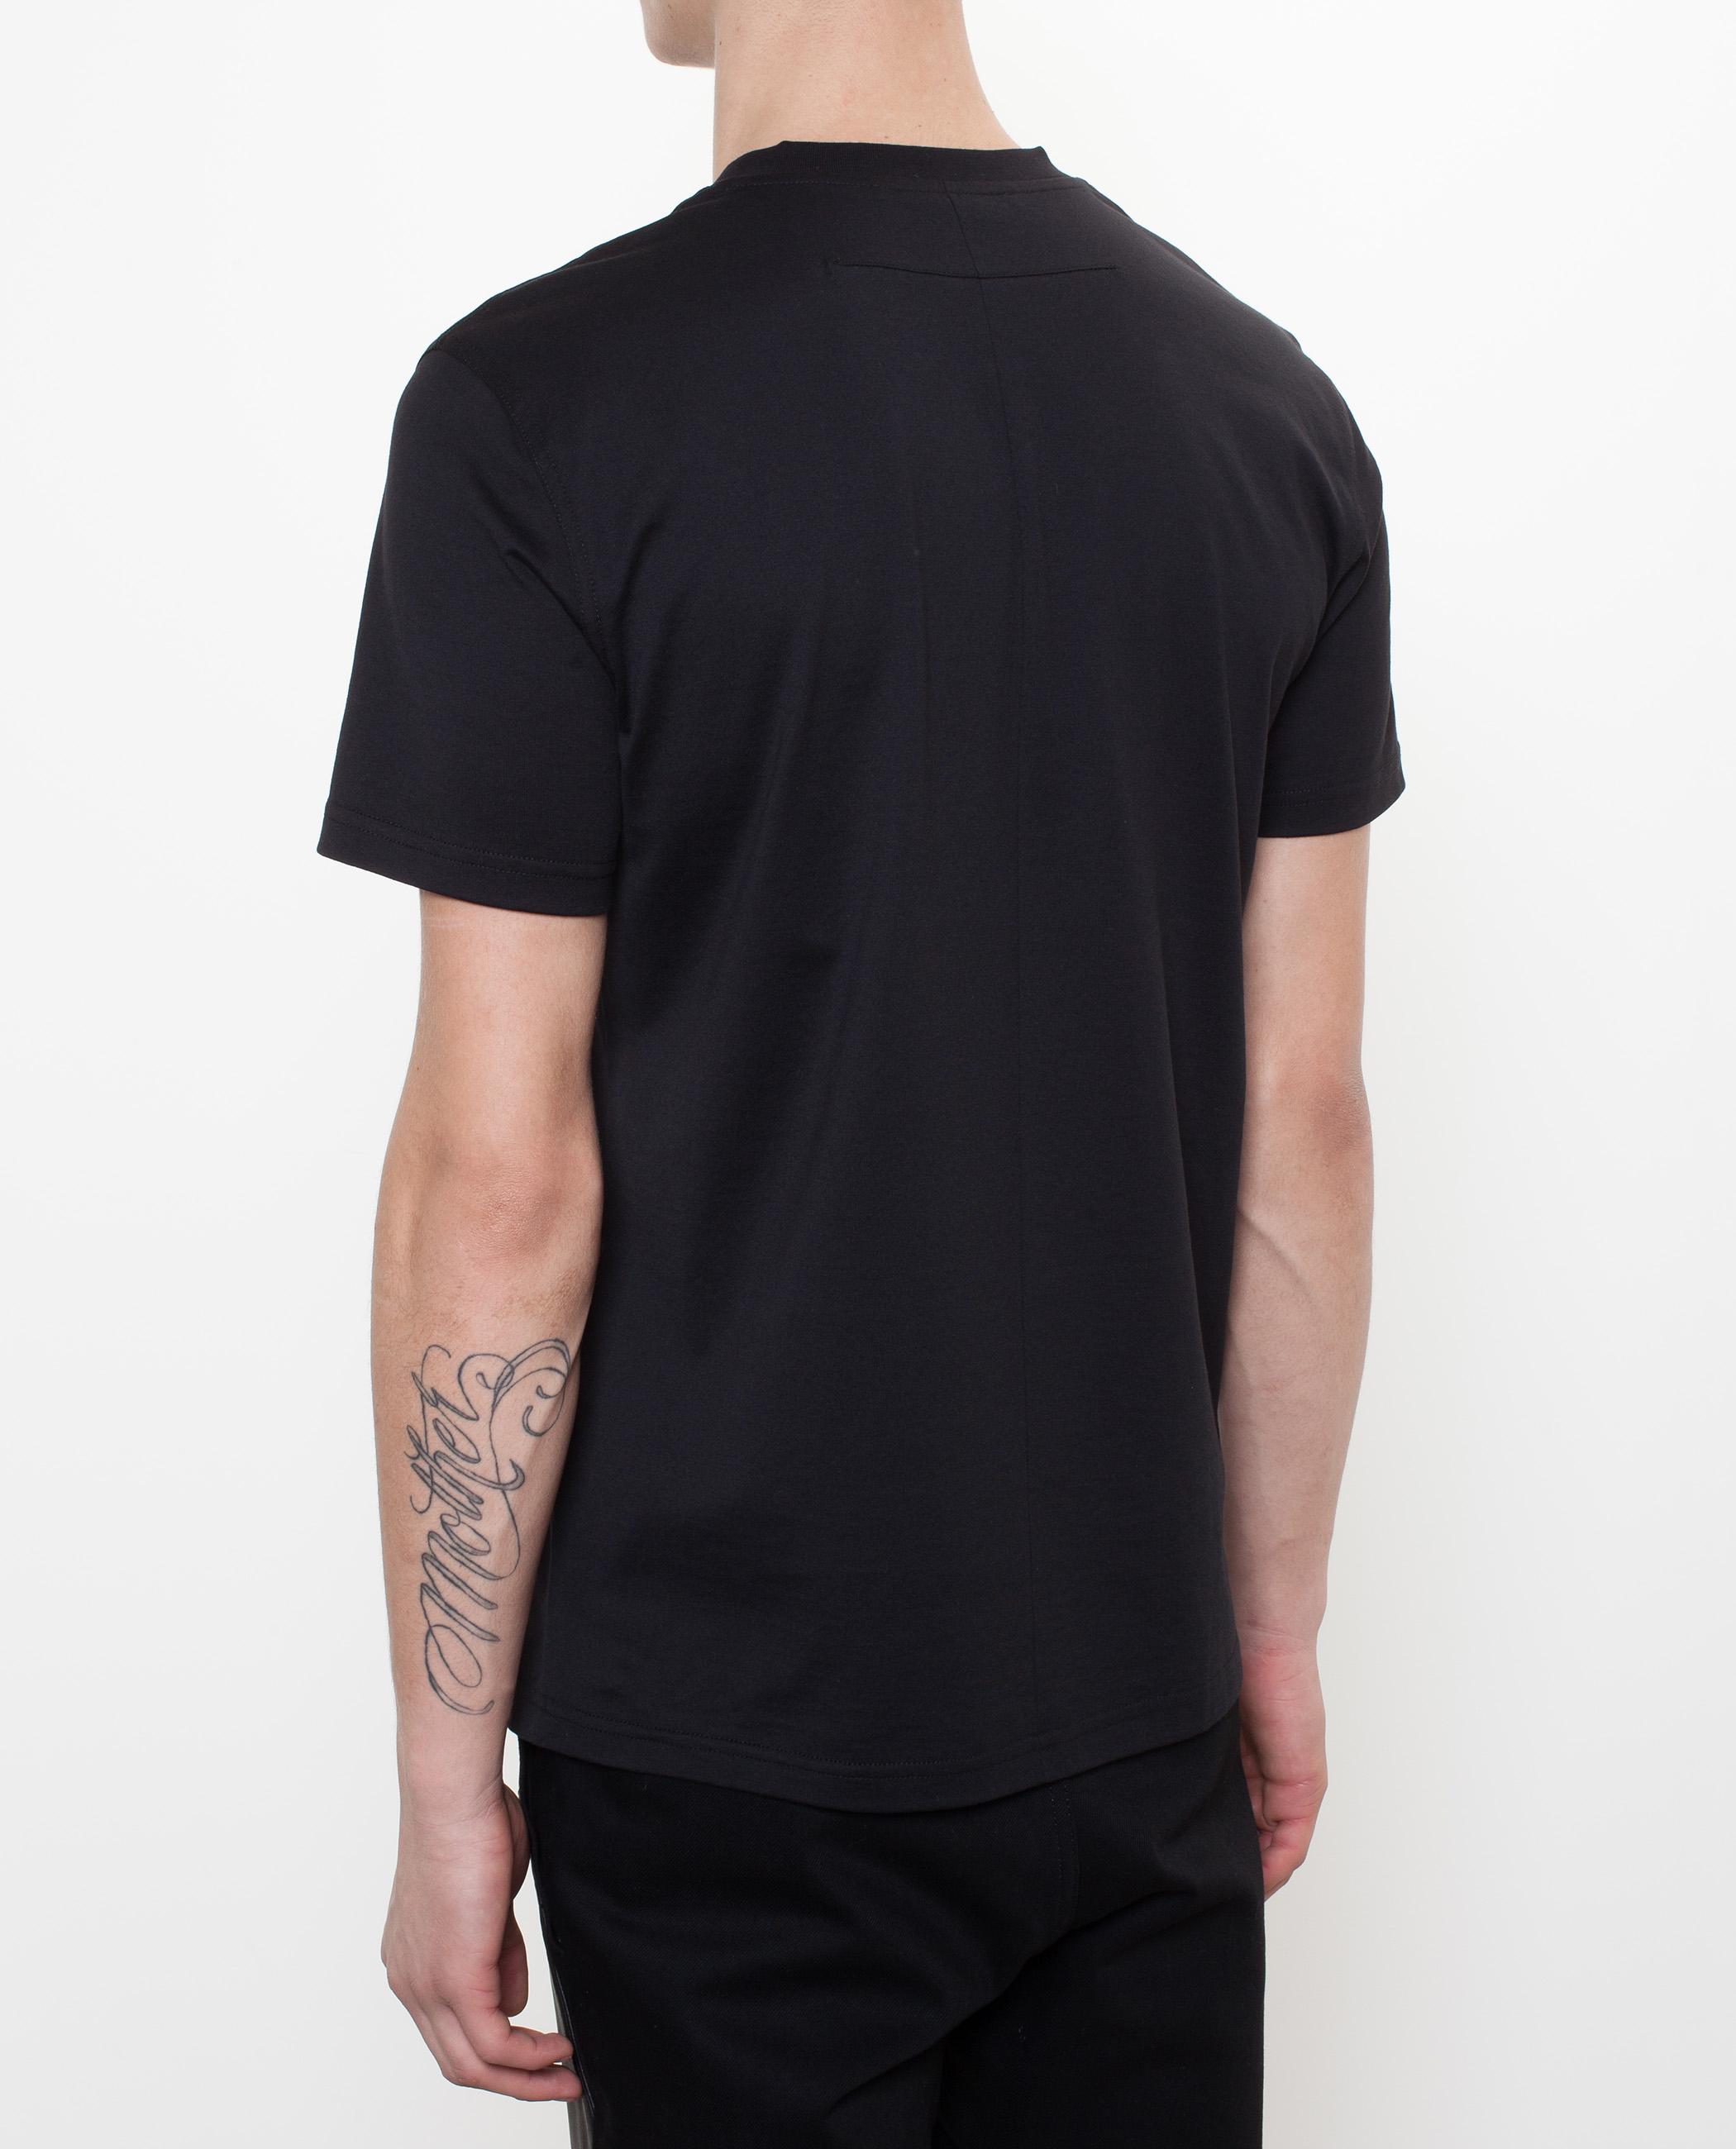 lyst givenchy pin up girl t shirt in black for men. Black Bedroom Furniture Sets. Home Design Ideas